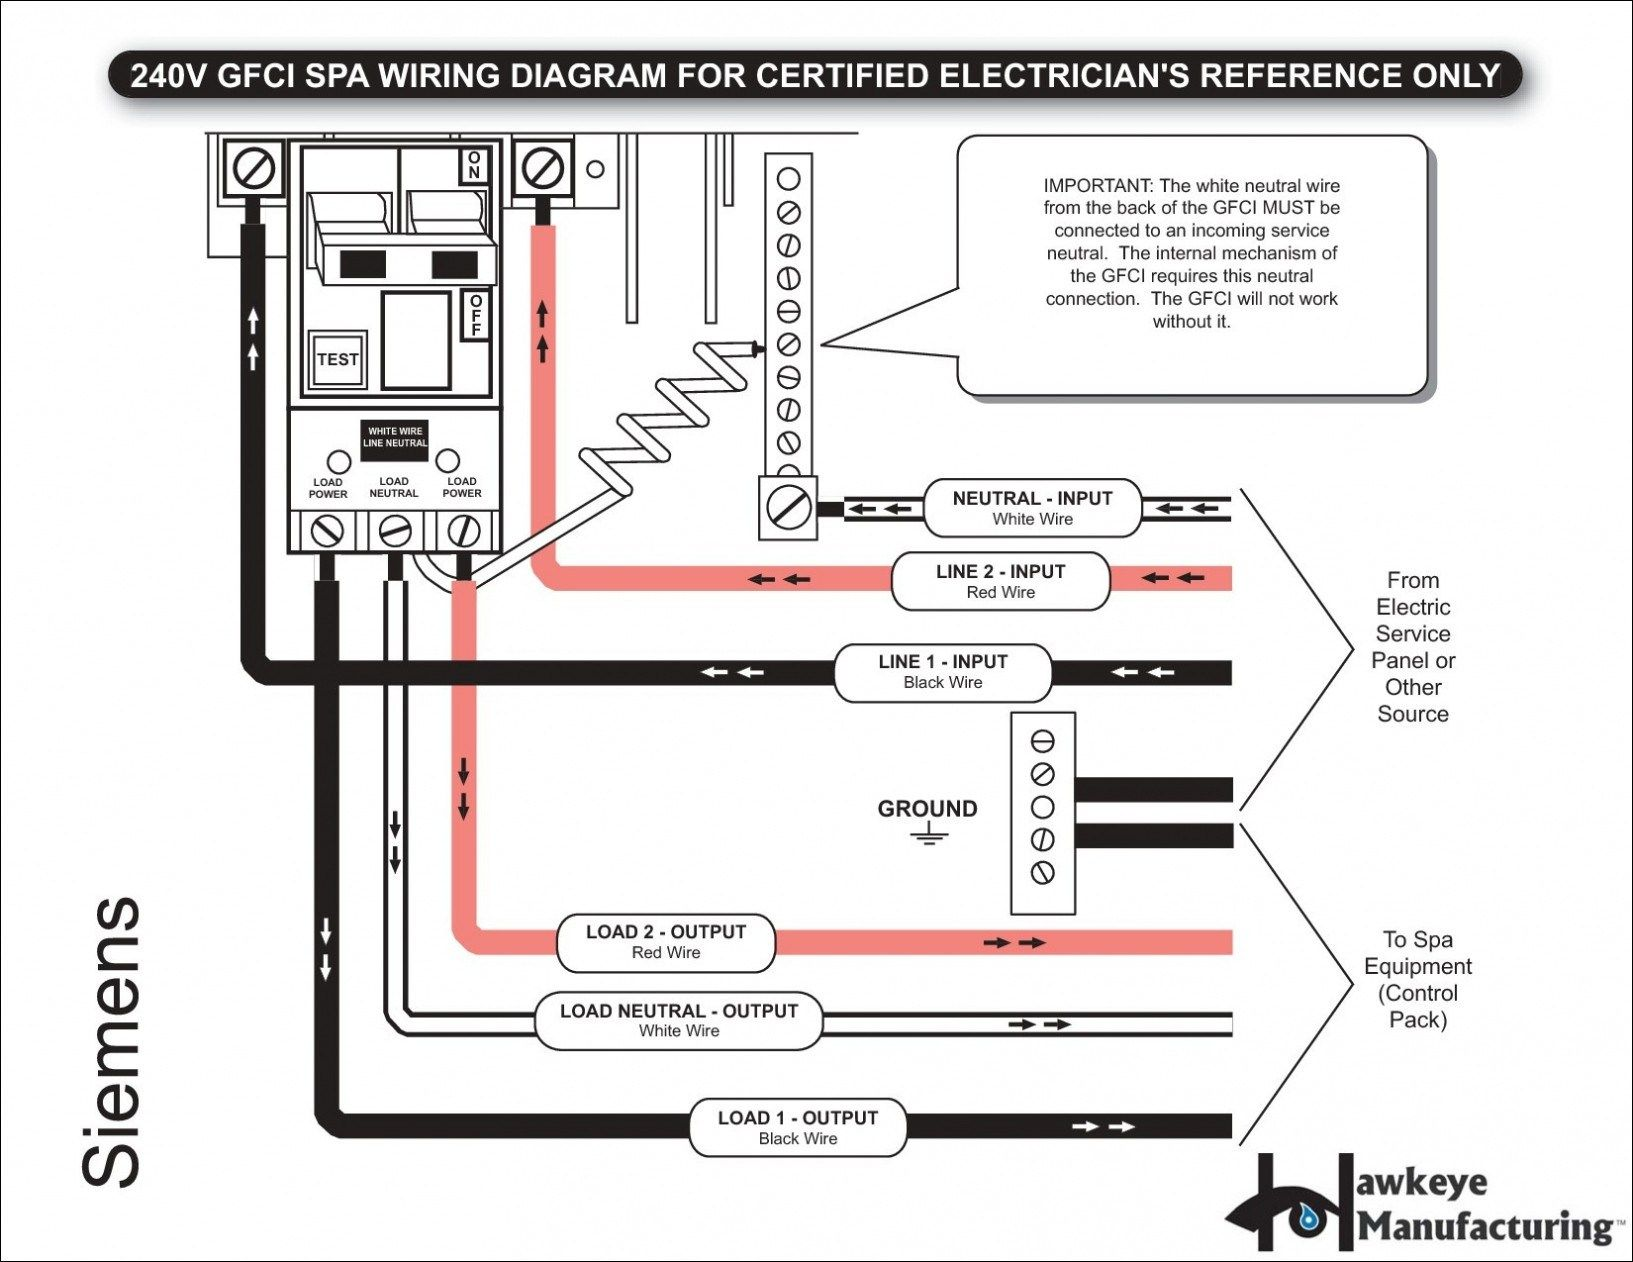 19 Stunning Circuit Breaker Wiring Diagram S